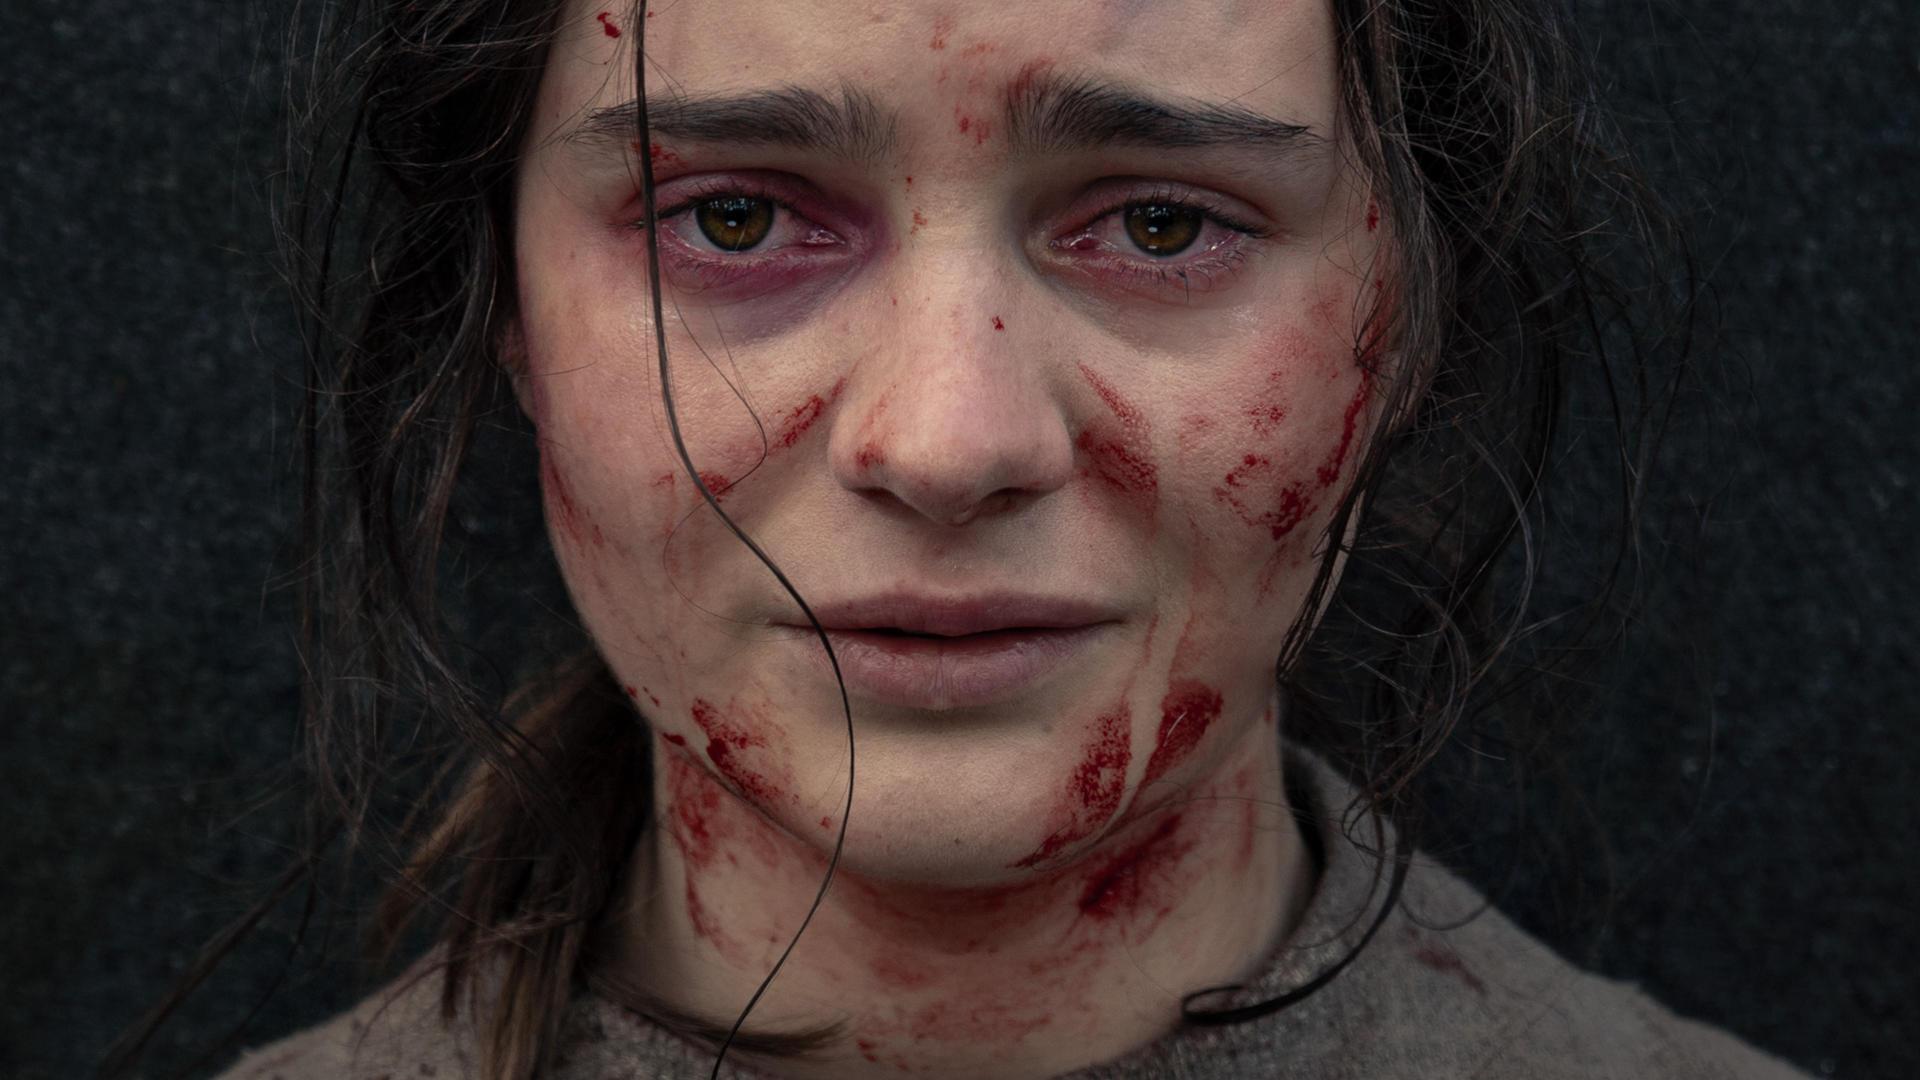 El regreso de Jennifer Kent, The Nightingale de IFC Films, ya tiene tráiler oficial